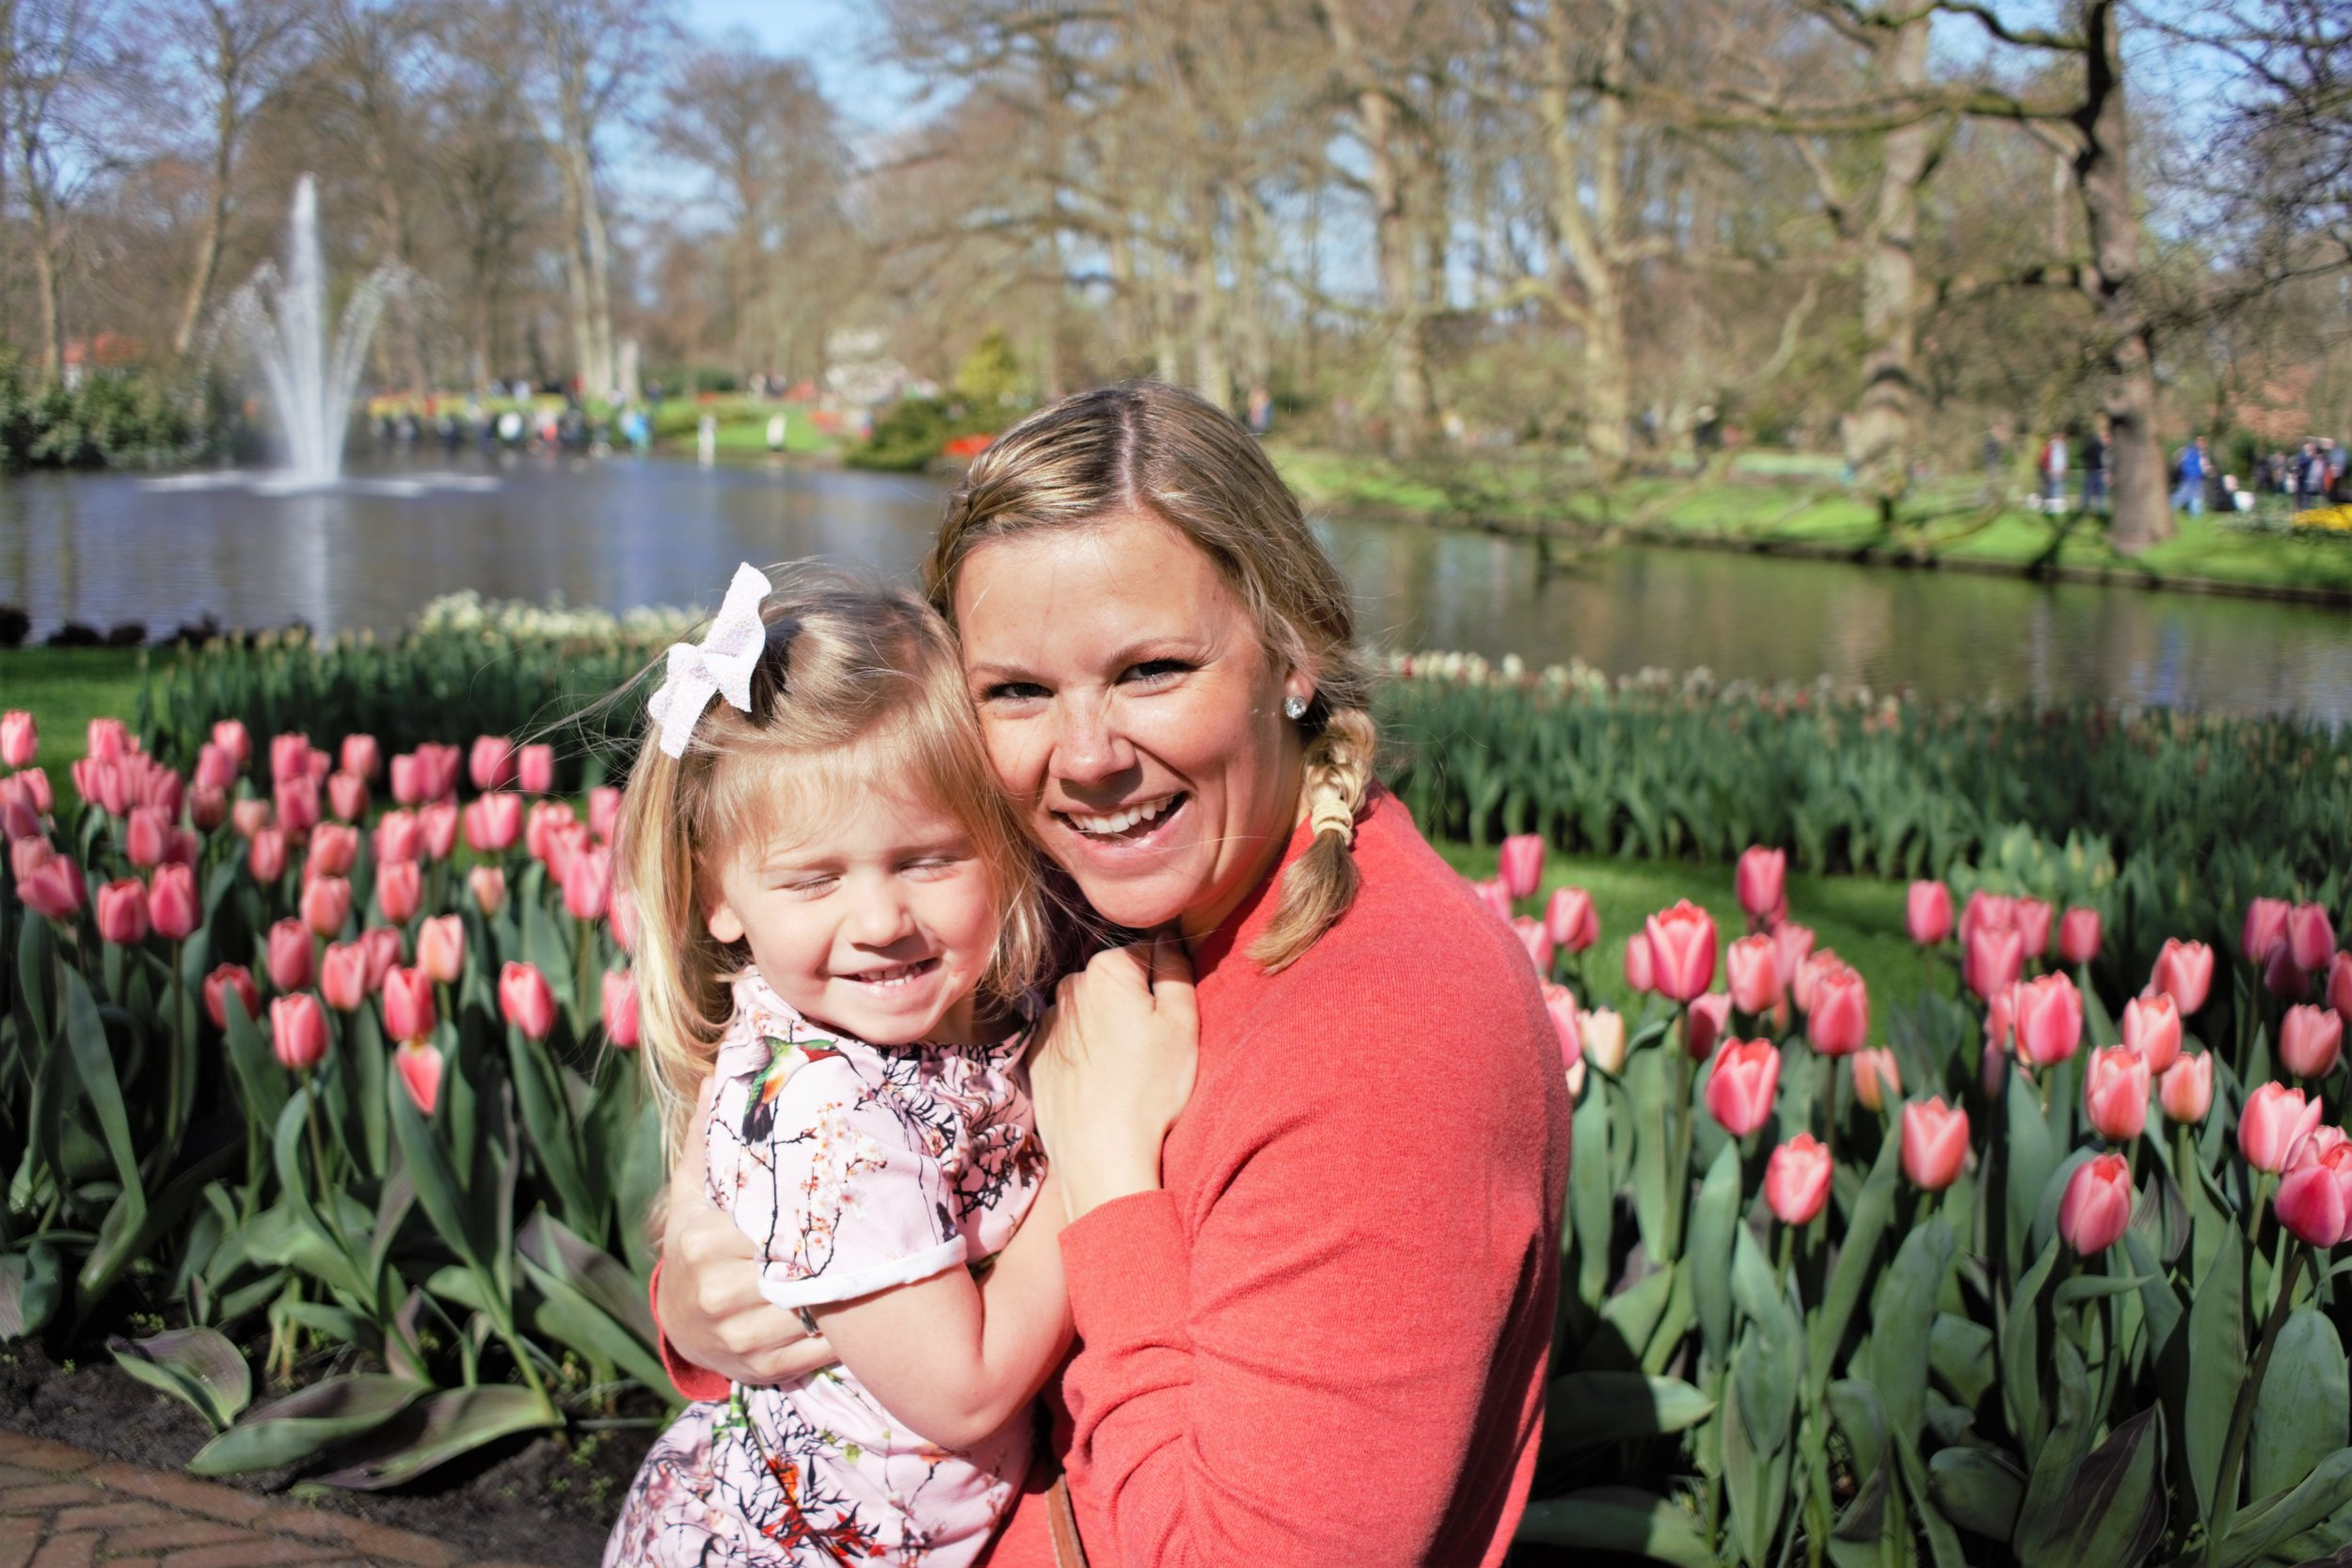 Charletta & Mommy enjoying the beautiful weather & gardens of Keukenhof